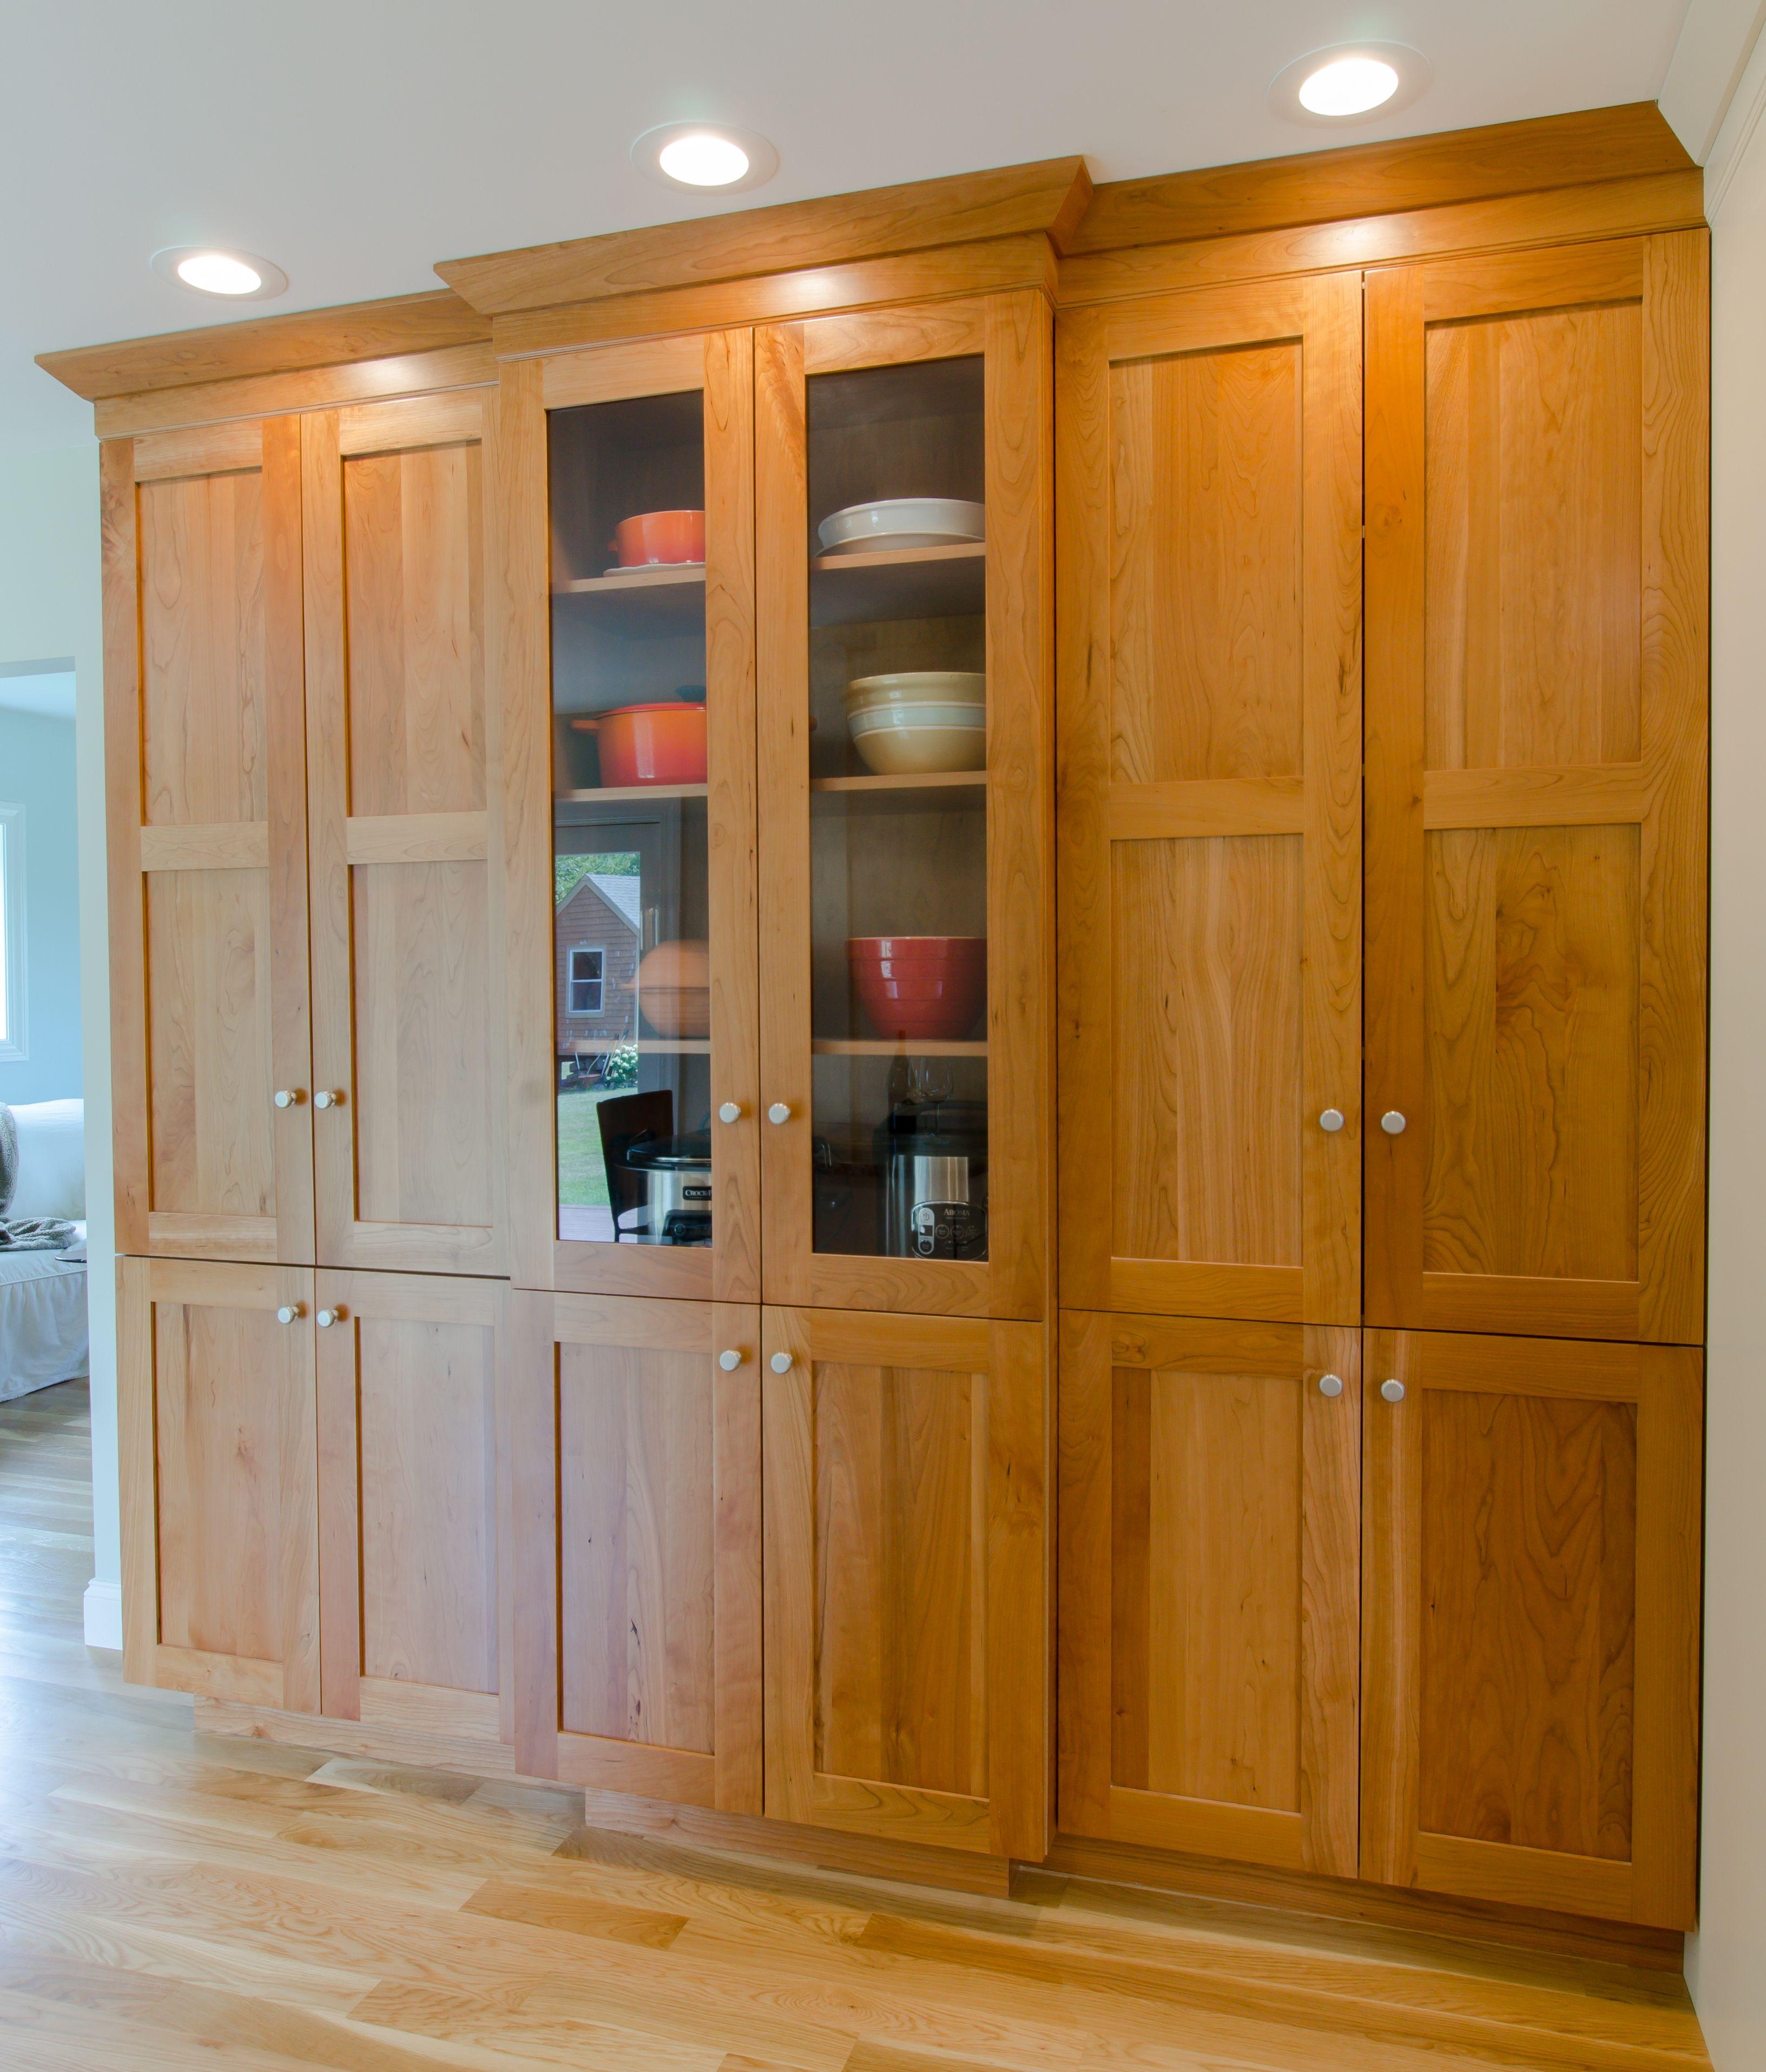 Kitchen Pantry Pantry Cabinet Kitchen Pantry Cabinet Freestanding Kitchen Pantry Storage Cabinet